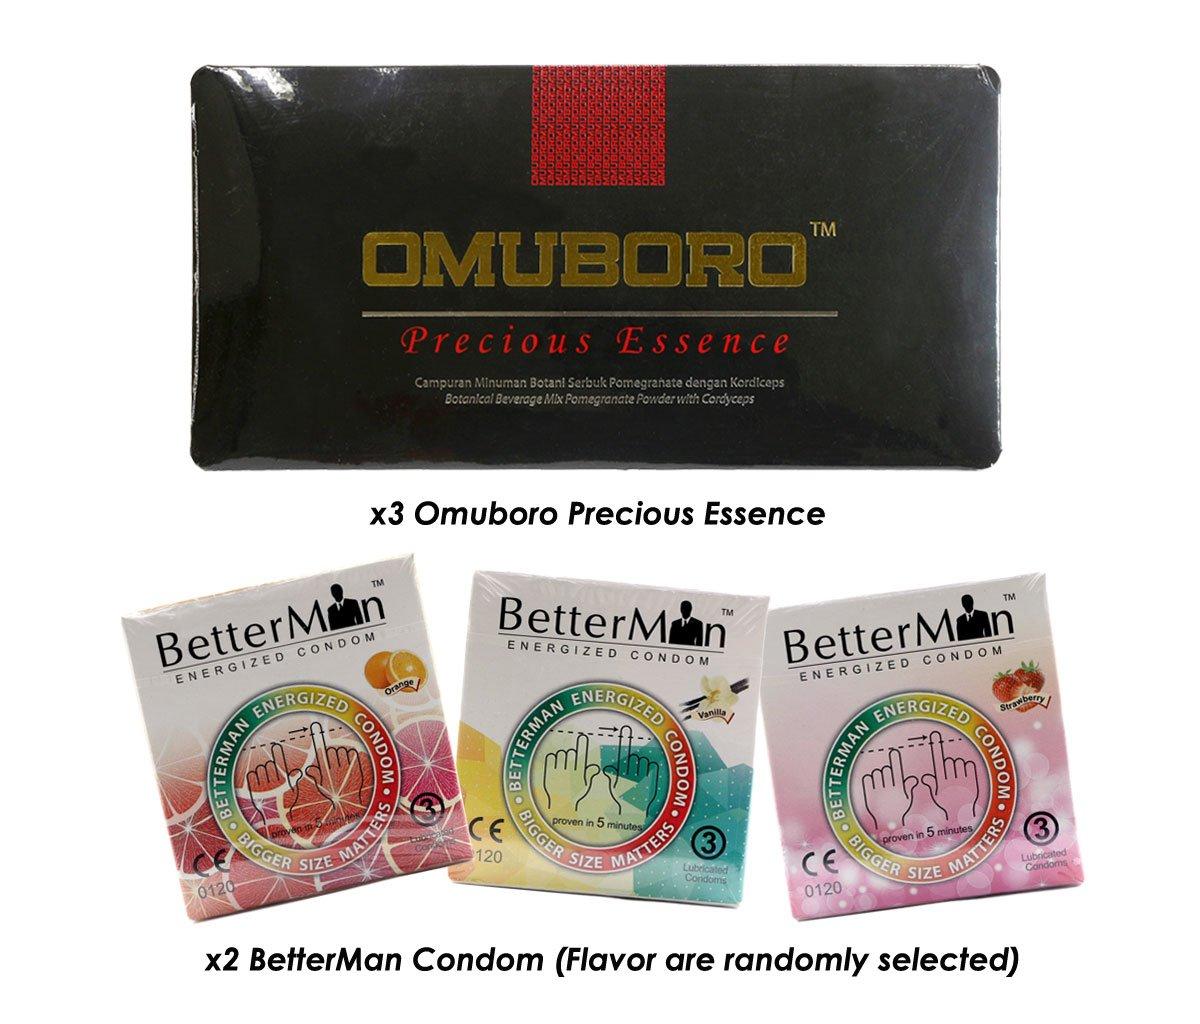 A ManPower Health (3 Pack) Omuboro Precious Essence with (2 Box) BetterMan Energized Condom